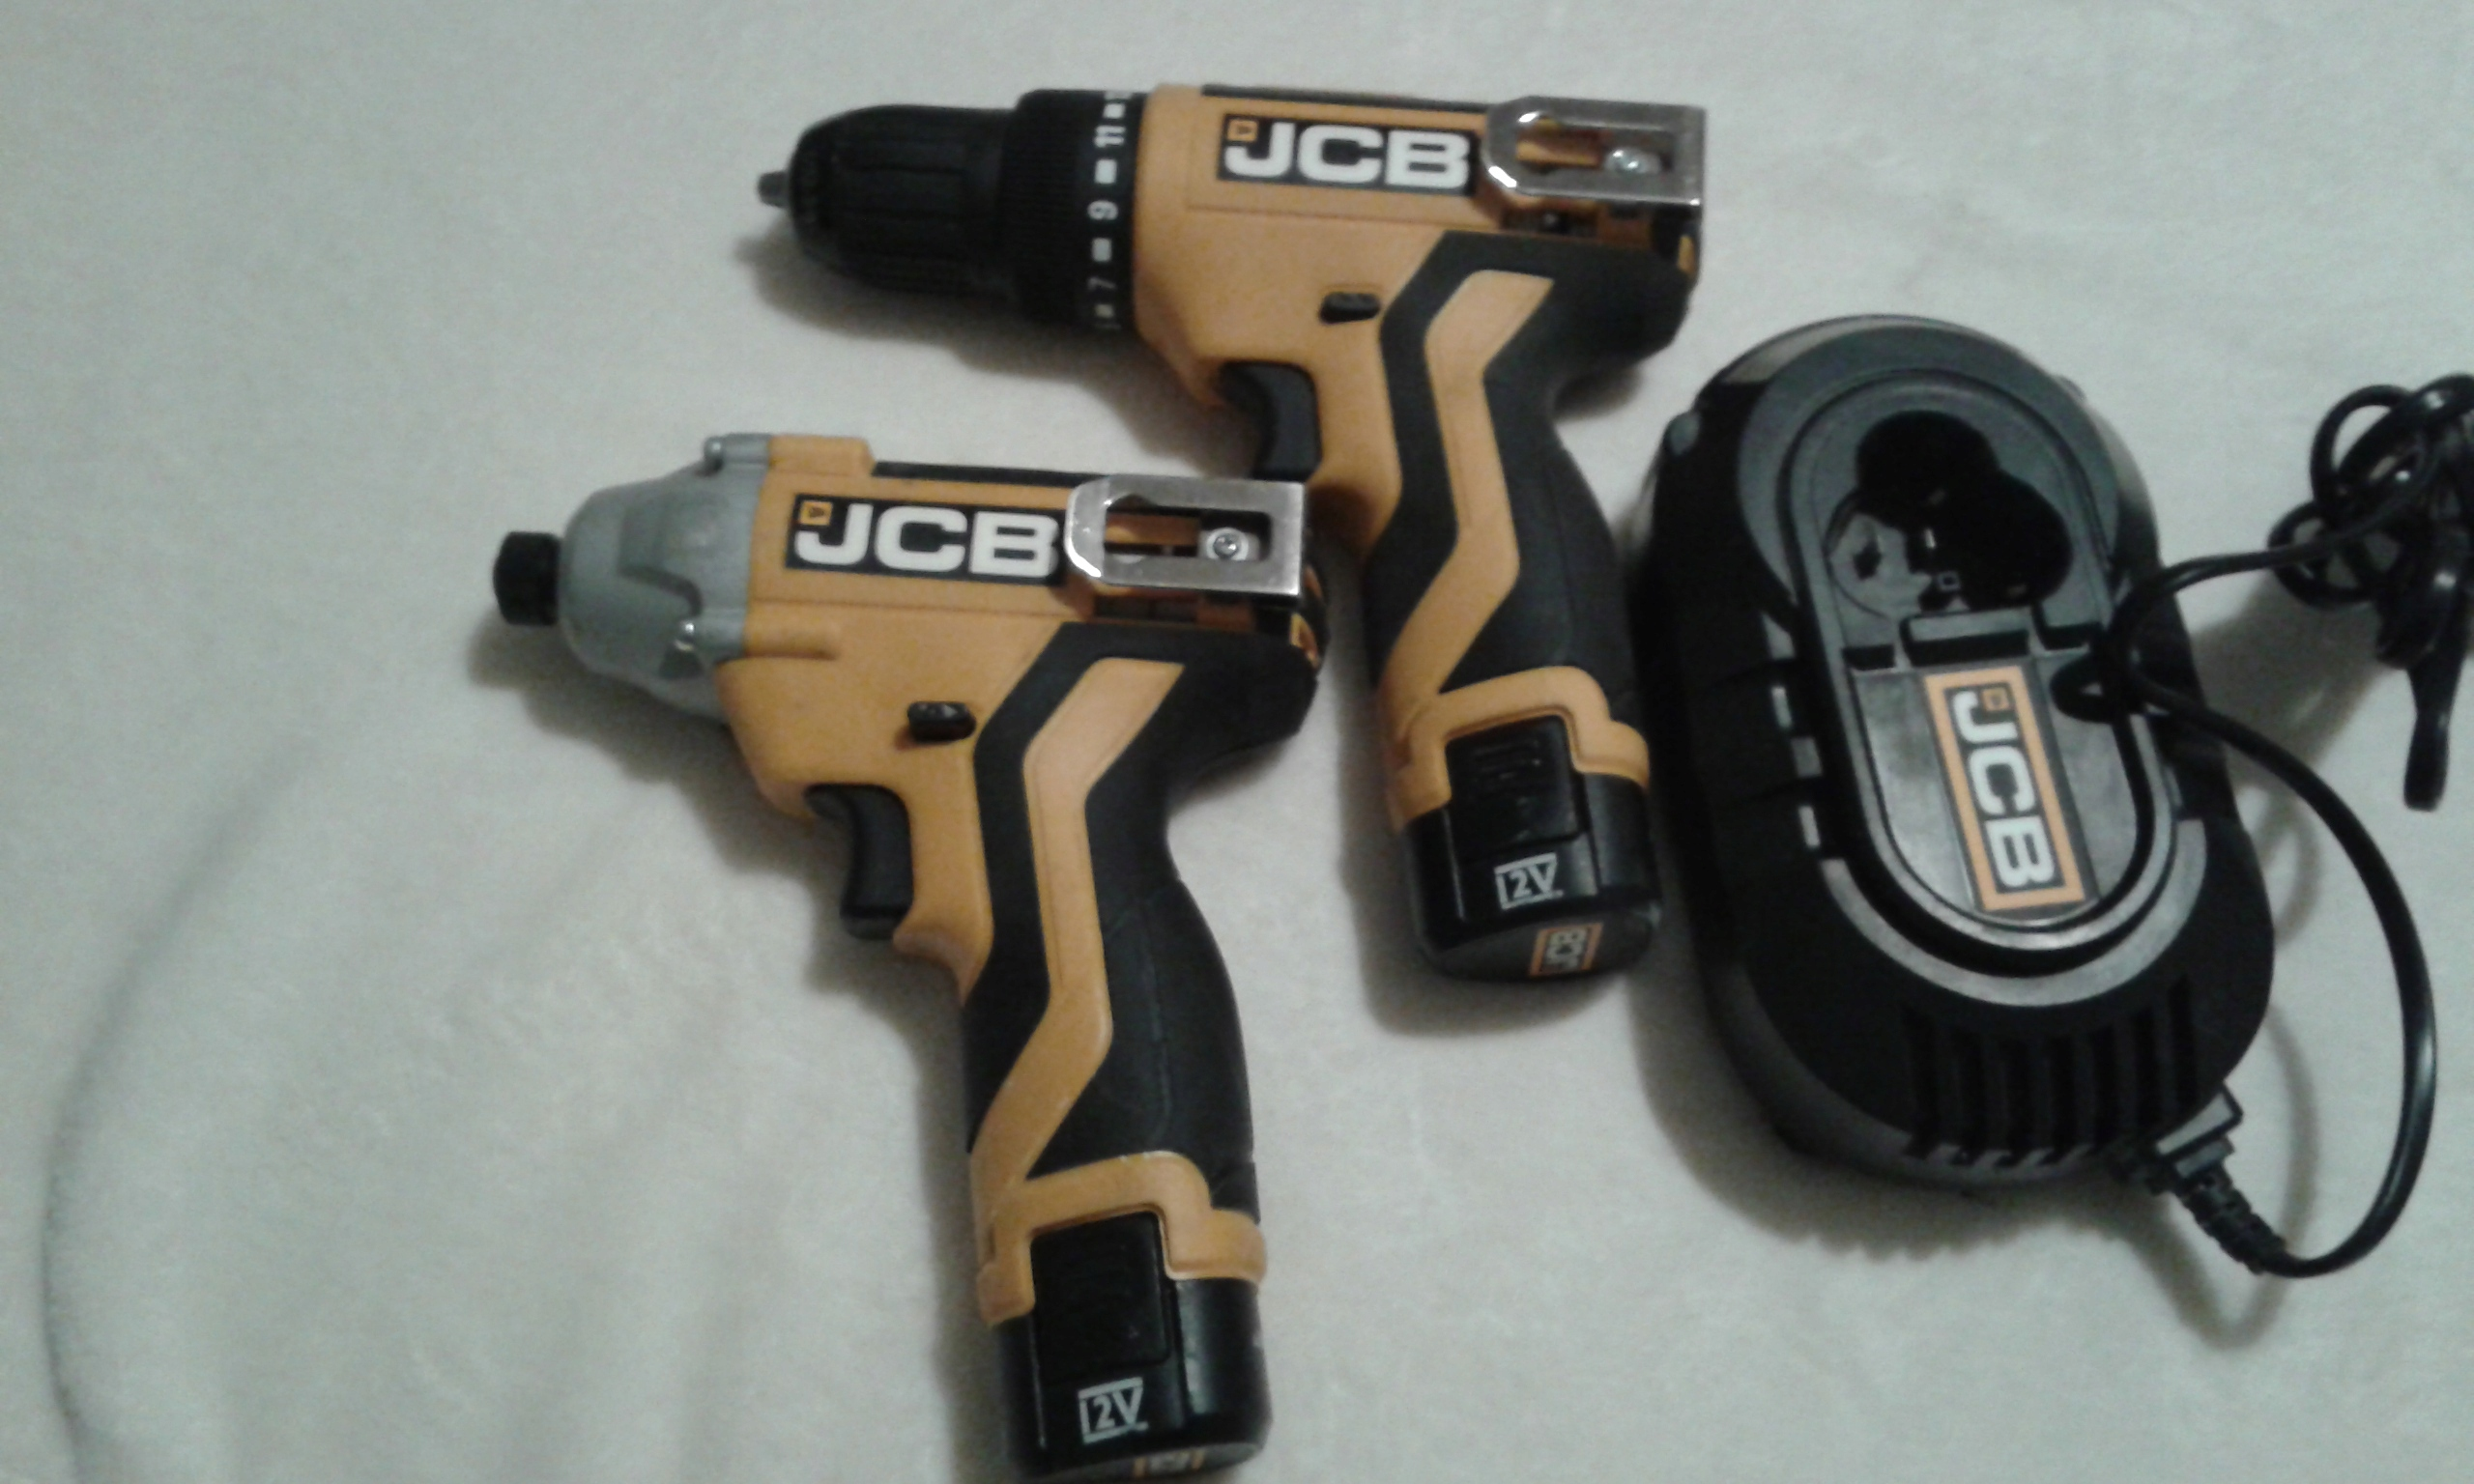 JCB WKRETARKA +IMPACT 12V